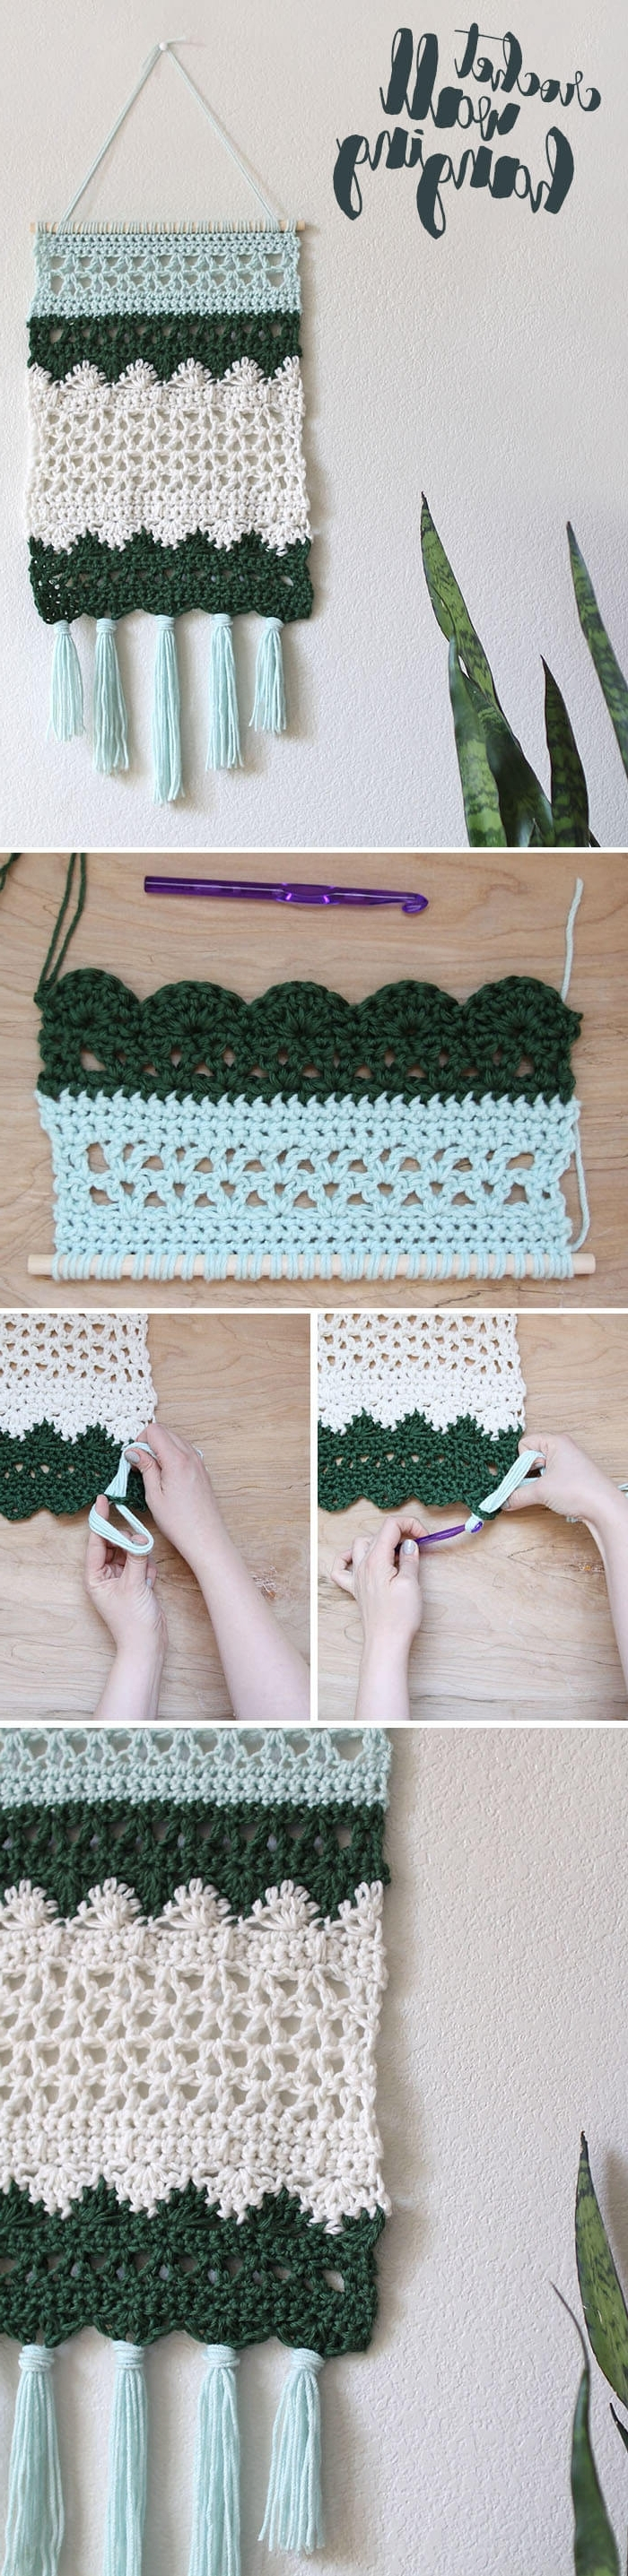 Crochet Wall Hanging Pattern – Persia Lou Throughout Fashionable Crochet Wall Art (View 18 of 20)